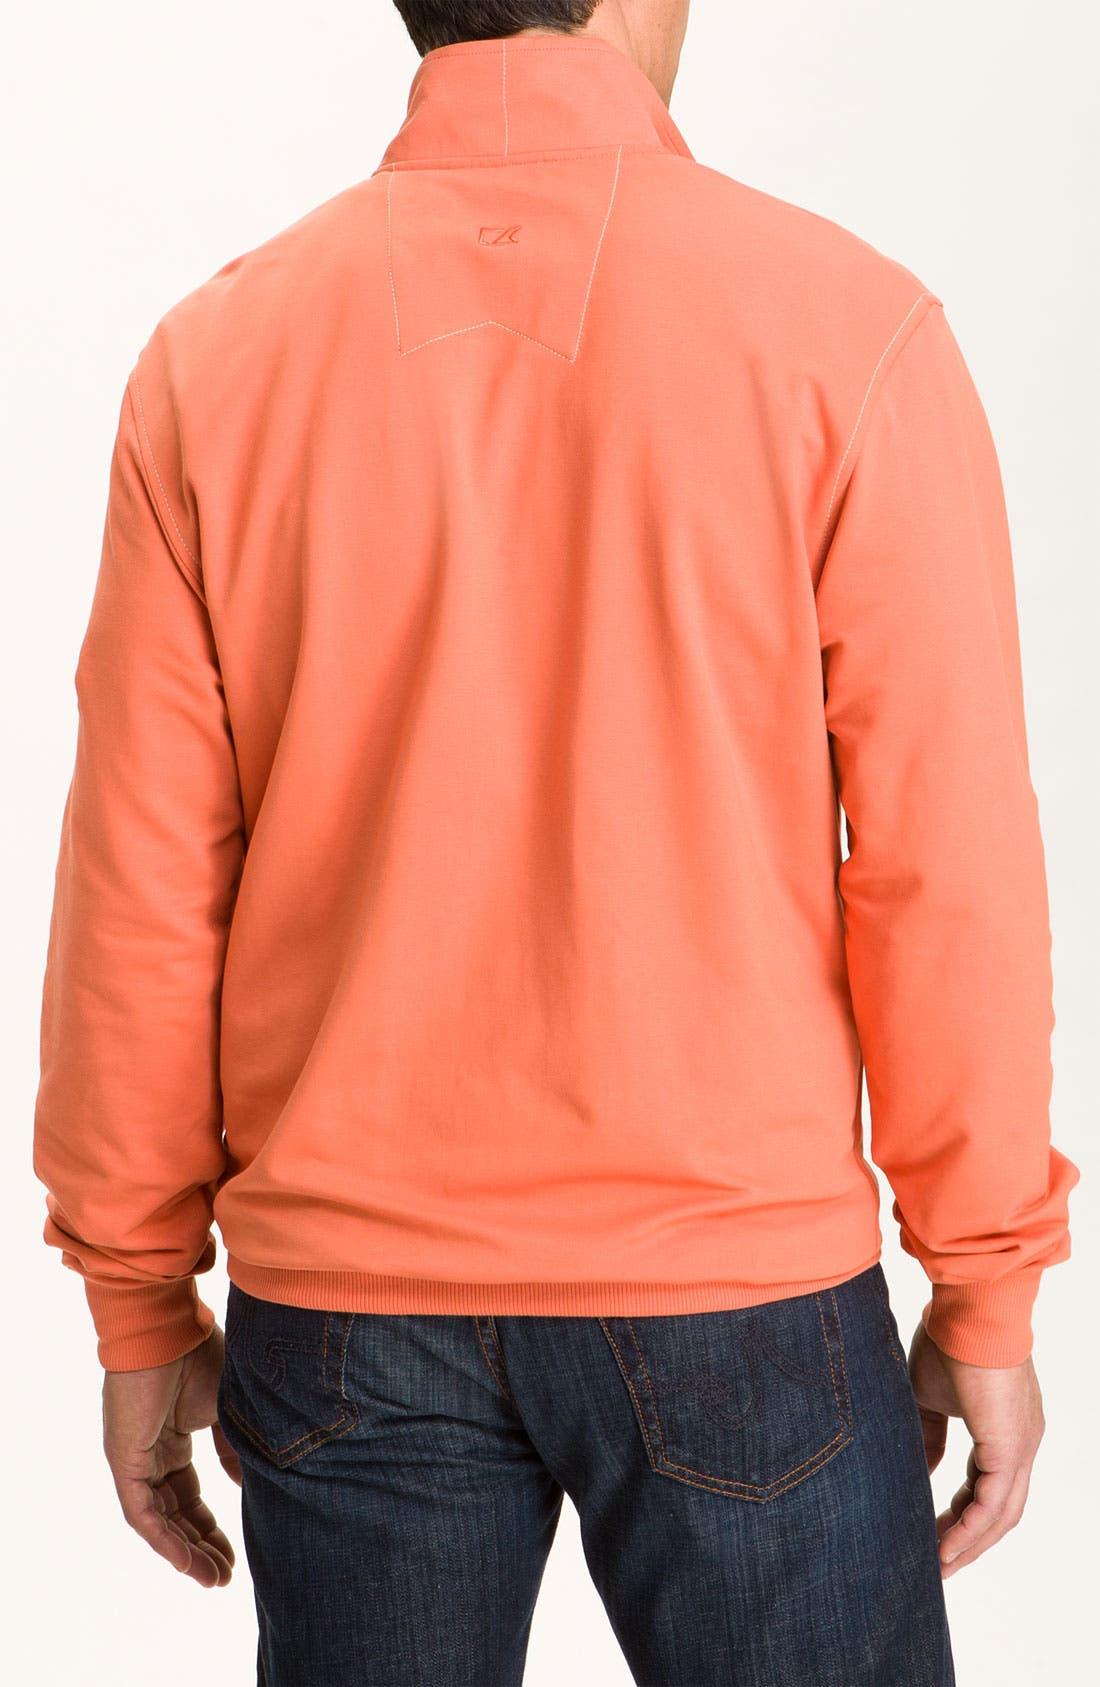 Alternate Image 2  - Cutter & Buck 'Mackenzie' Pullover Sweatshirt